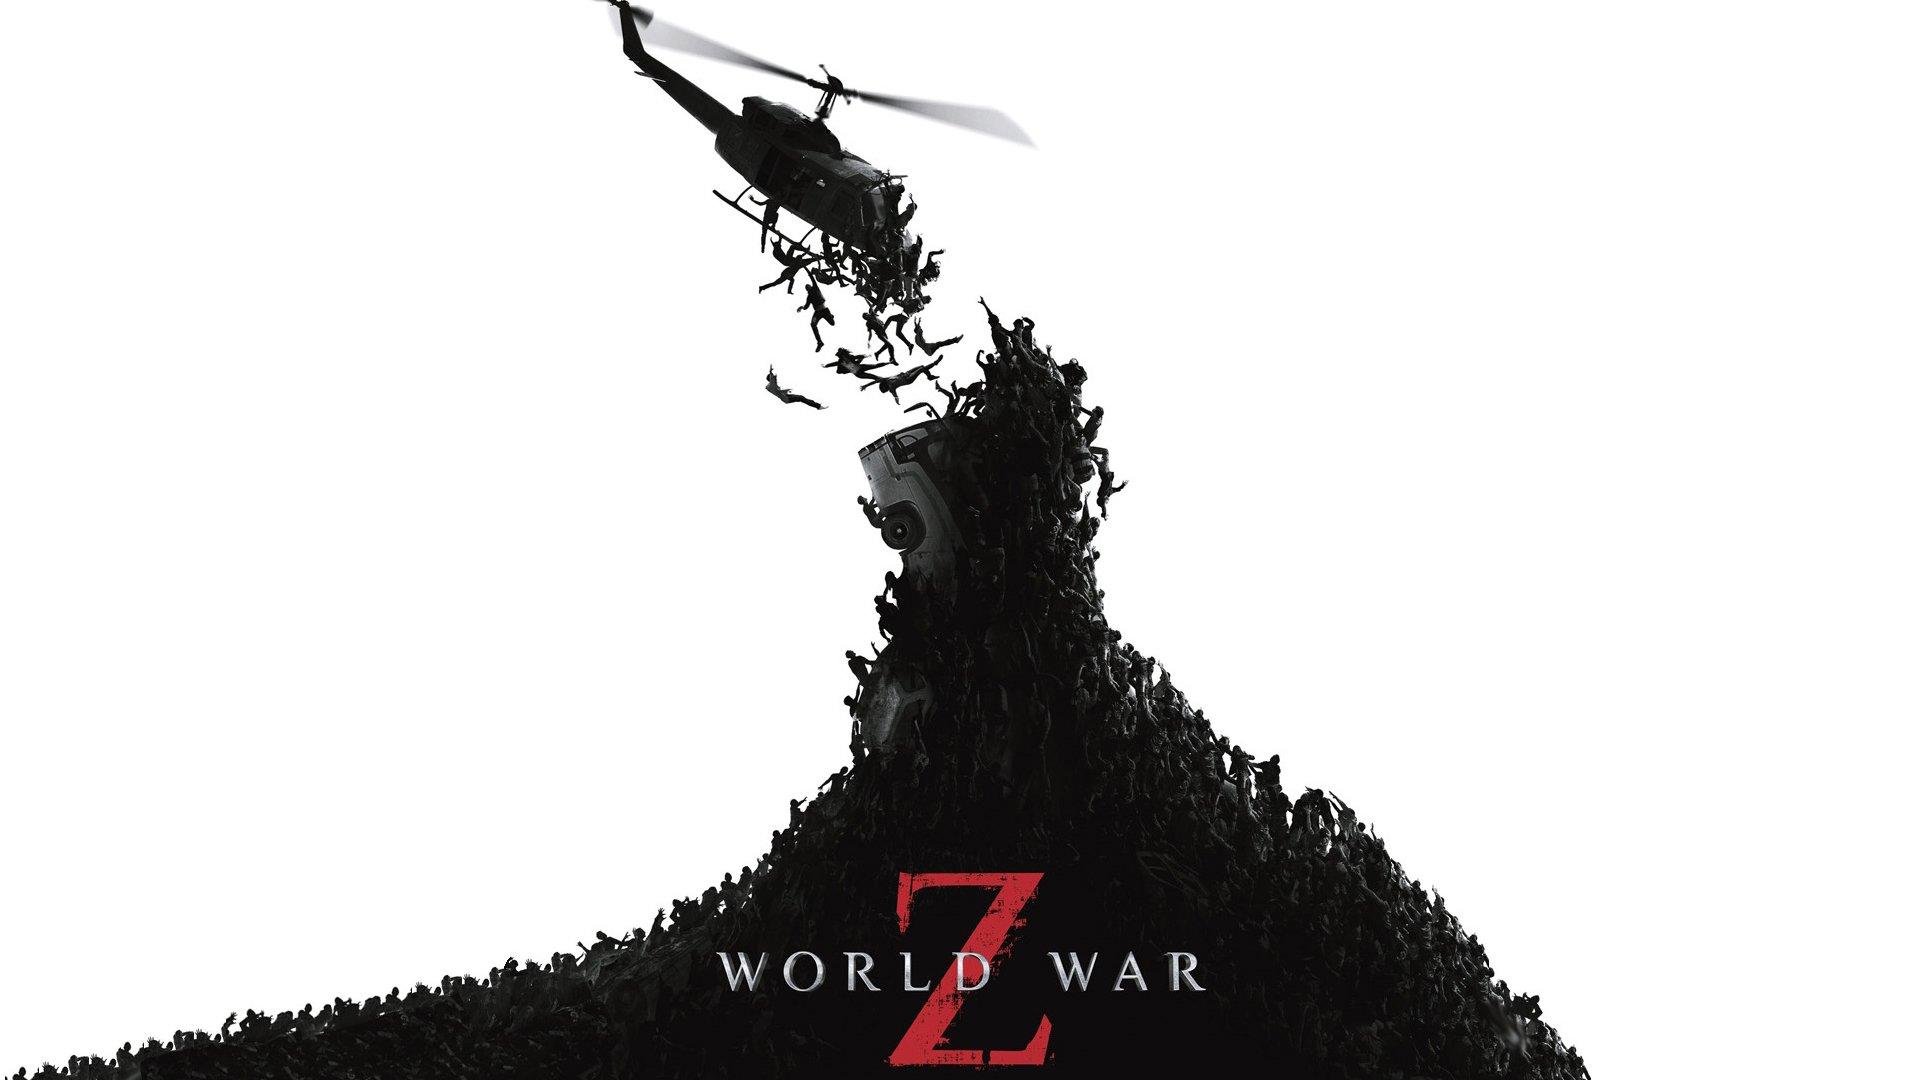 World War Z HD Wallpaper Background Image 1920x1080 1920x1080